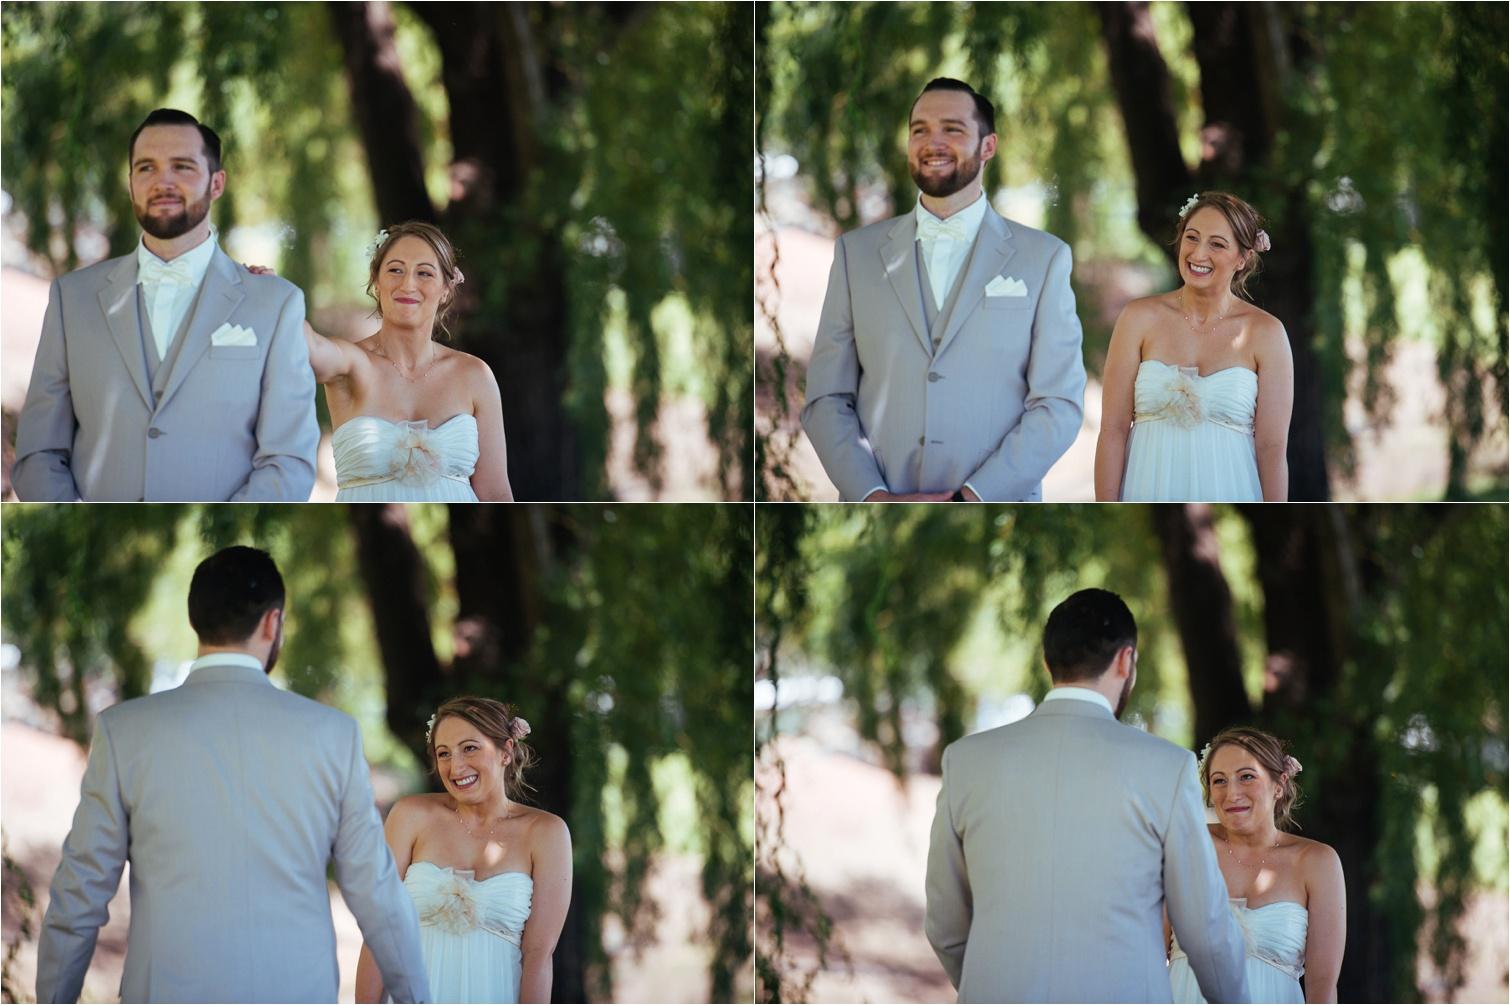 Jenny&Mitch_Sebel_Windsor_Sydney_Polo_Club_wedding-by_The_Follans_Gold_Coast_Wedding_Photographers_0024.jpg